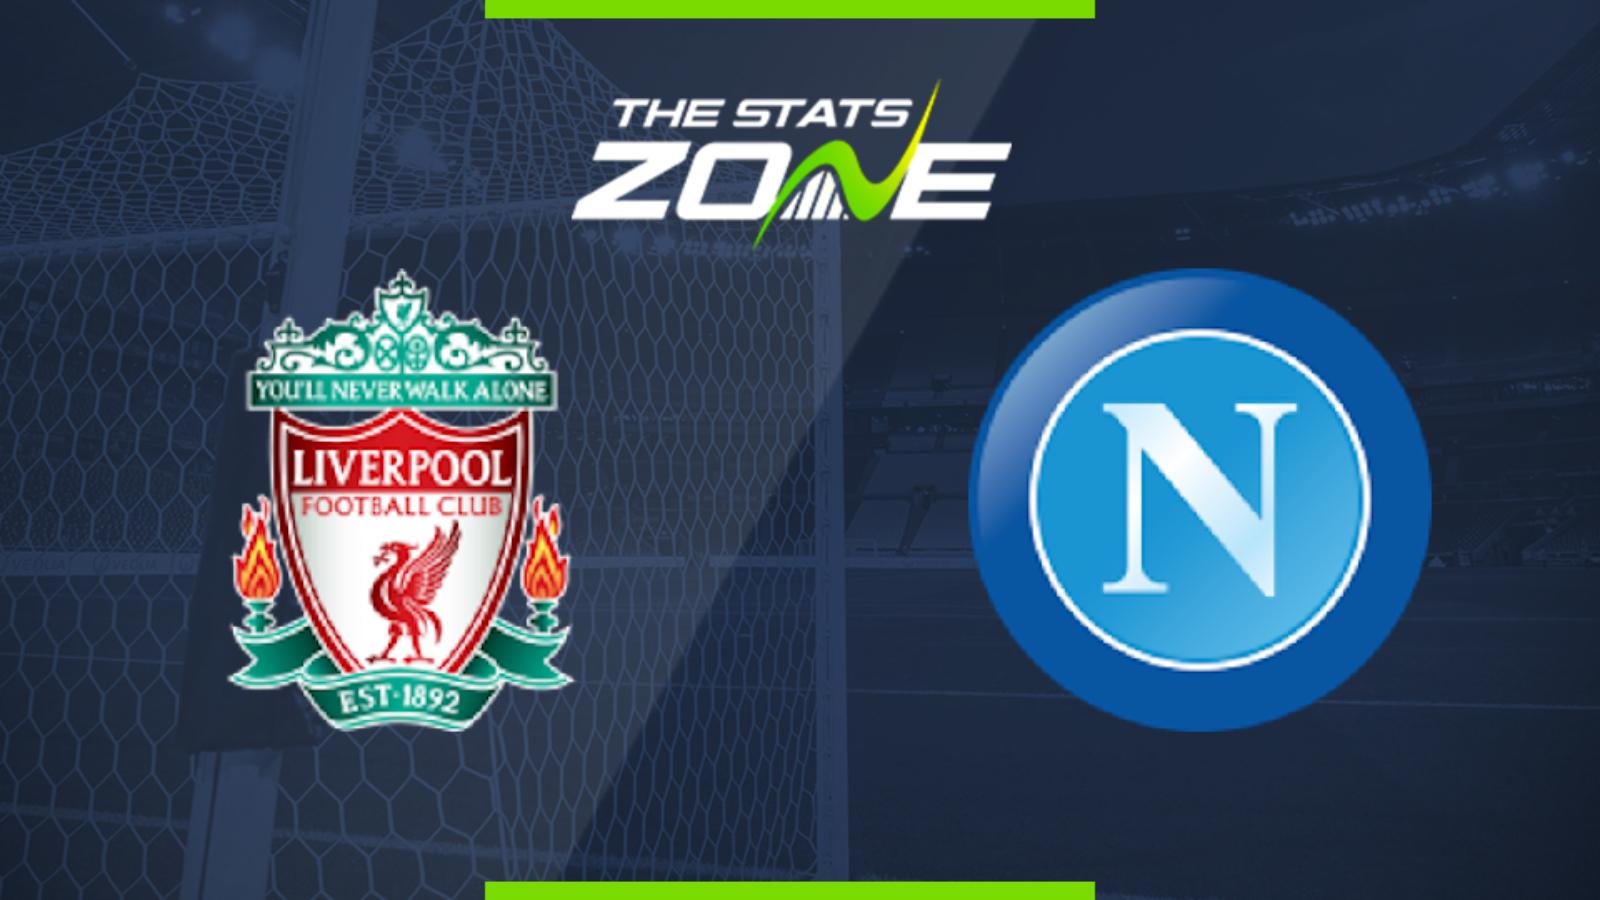 2019 20 Uefa Champions League Liverpool Vs Napoli Preview